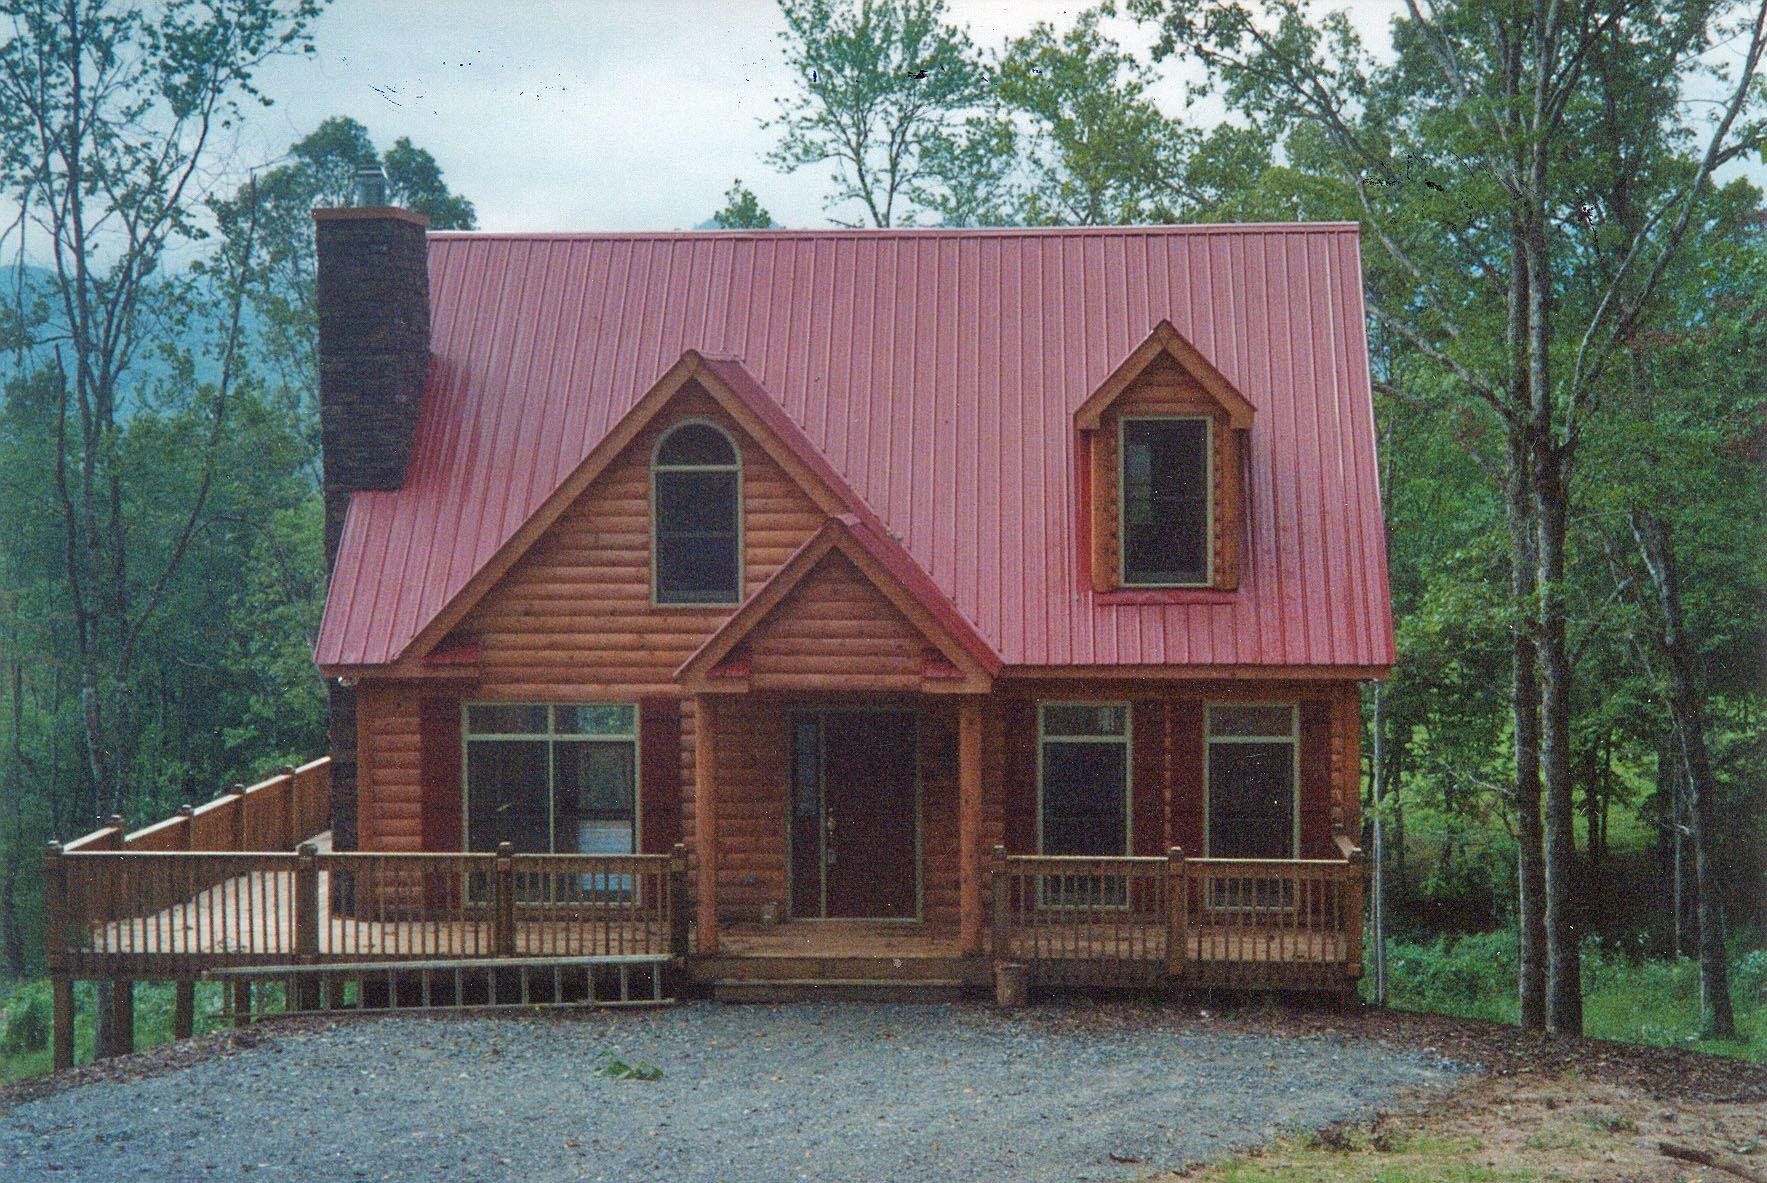 essex cape cod modular home design by nationwide homes customer